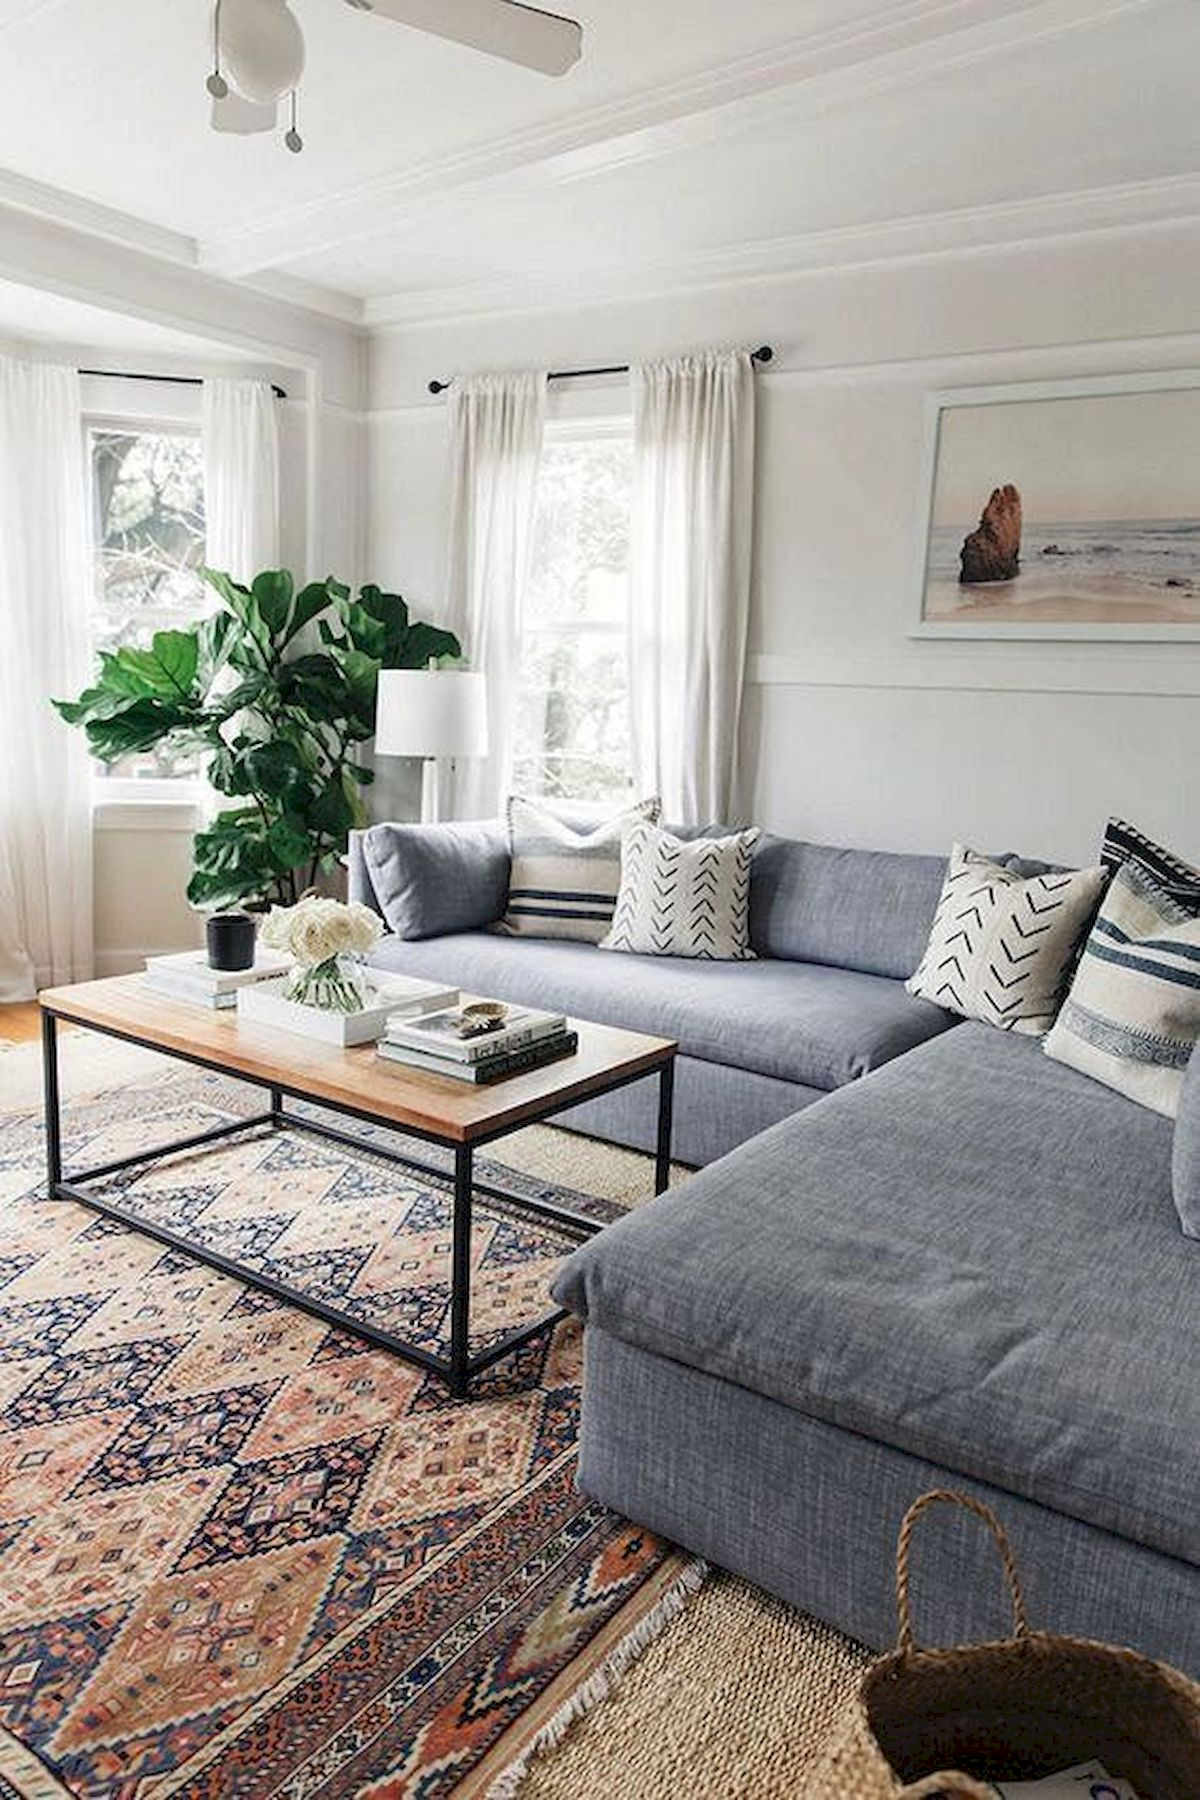 50 Gorgeous Living Room Decor and Design Ideas (47)